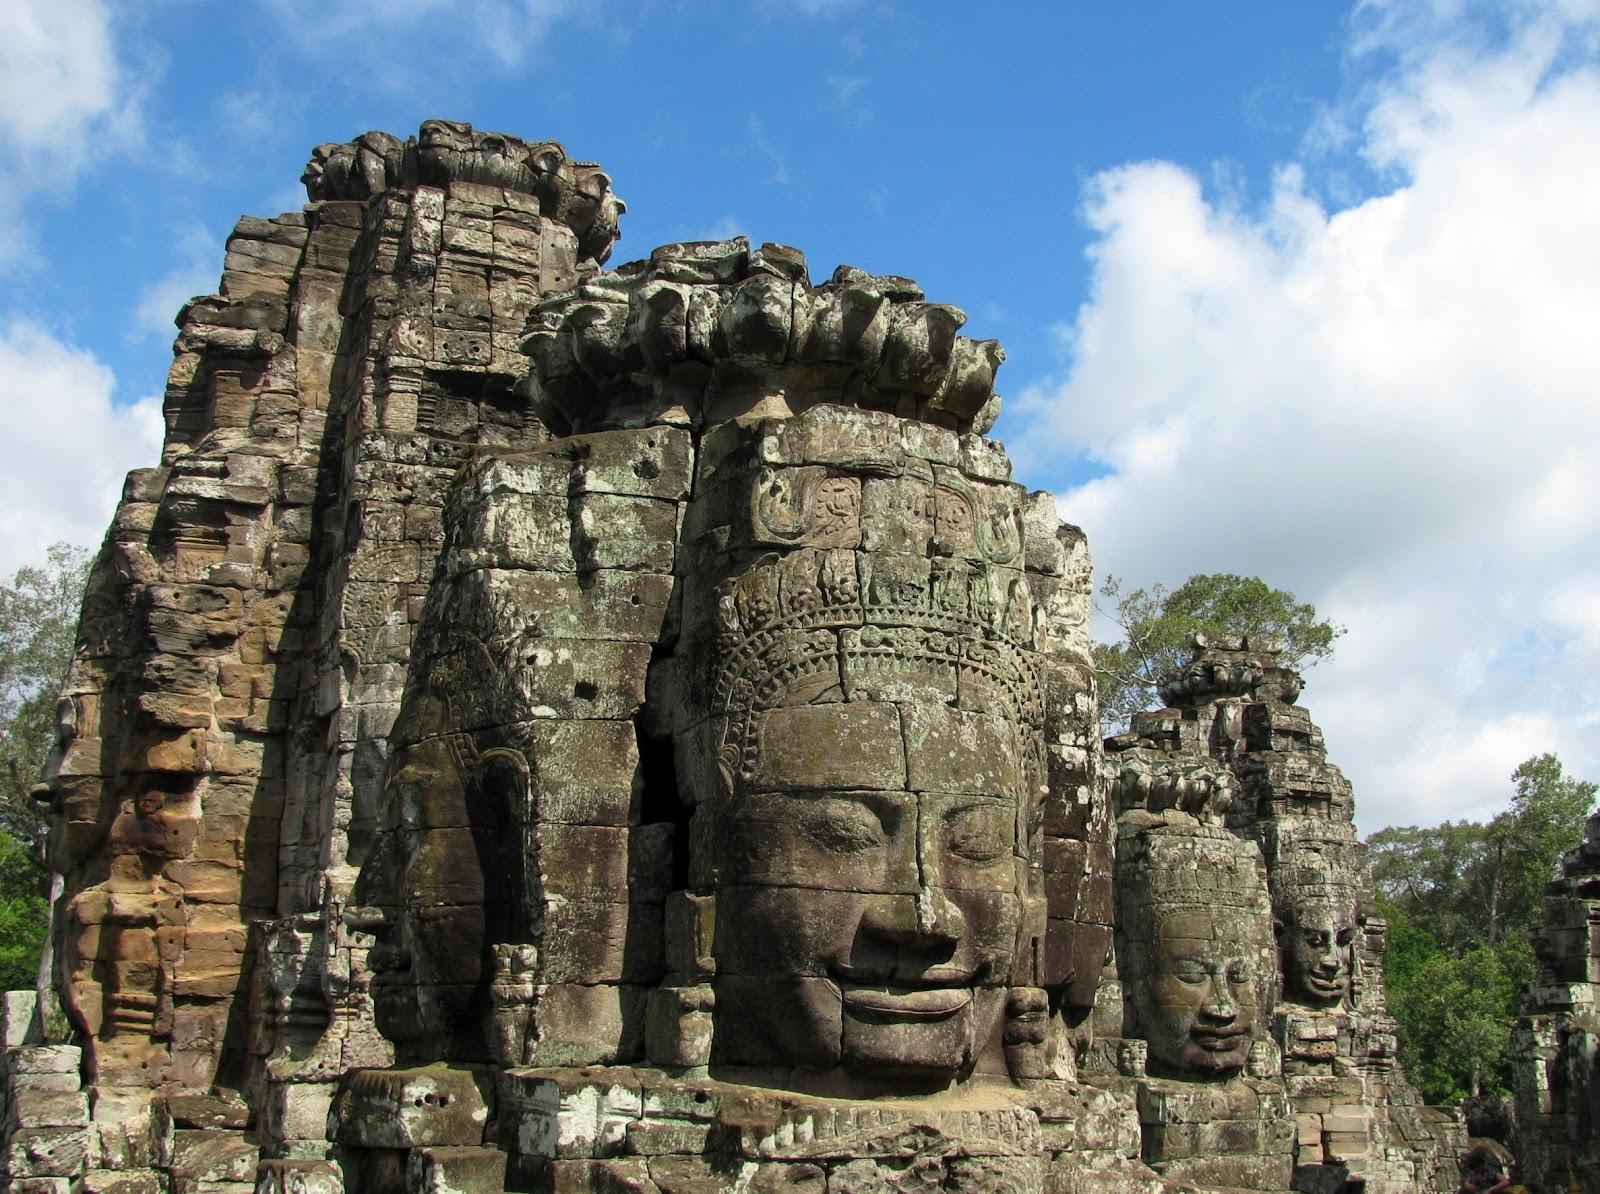 Travel & Adventures: Cambodia ( ព្រះរាជាណាចក្រកម្ពុជា ). A